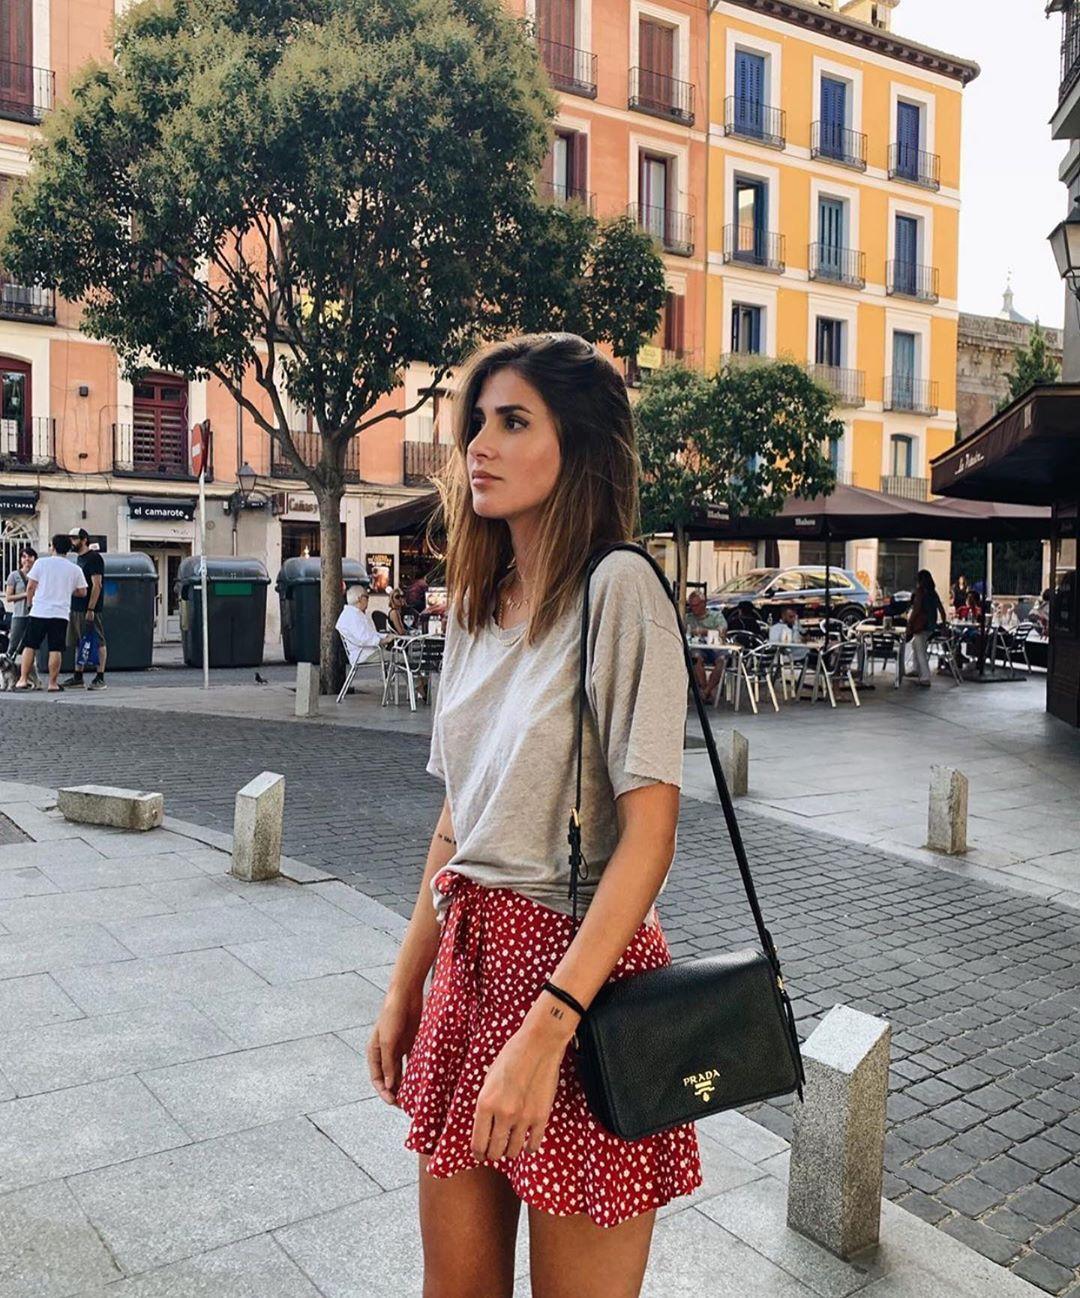 waistband skirt-shorts de Zara sur zarastreetstyle